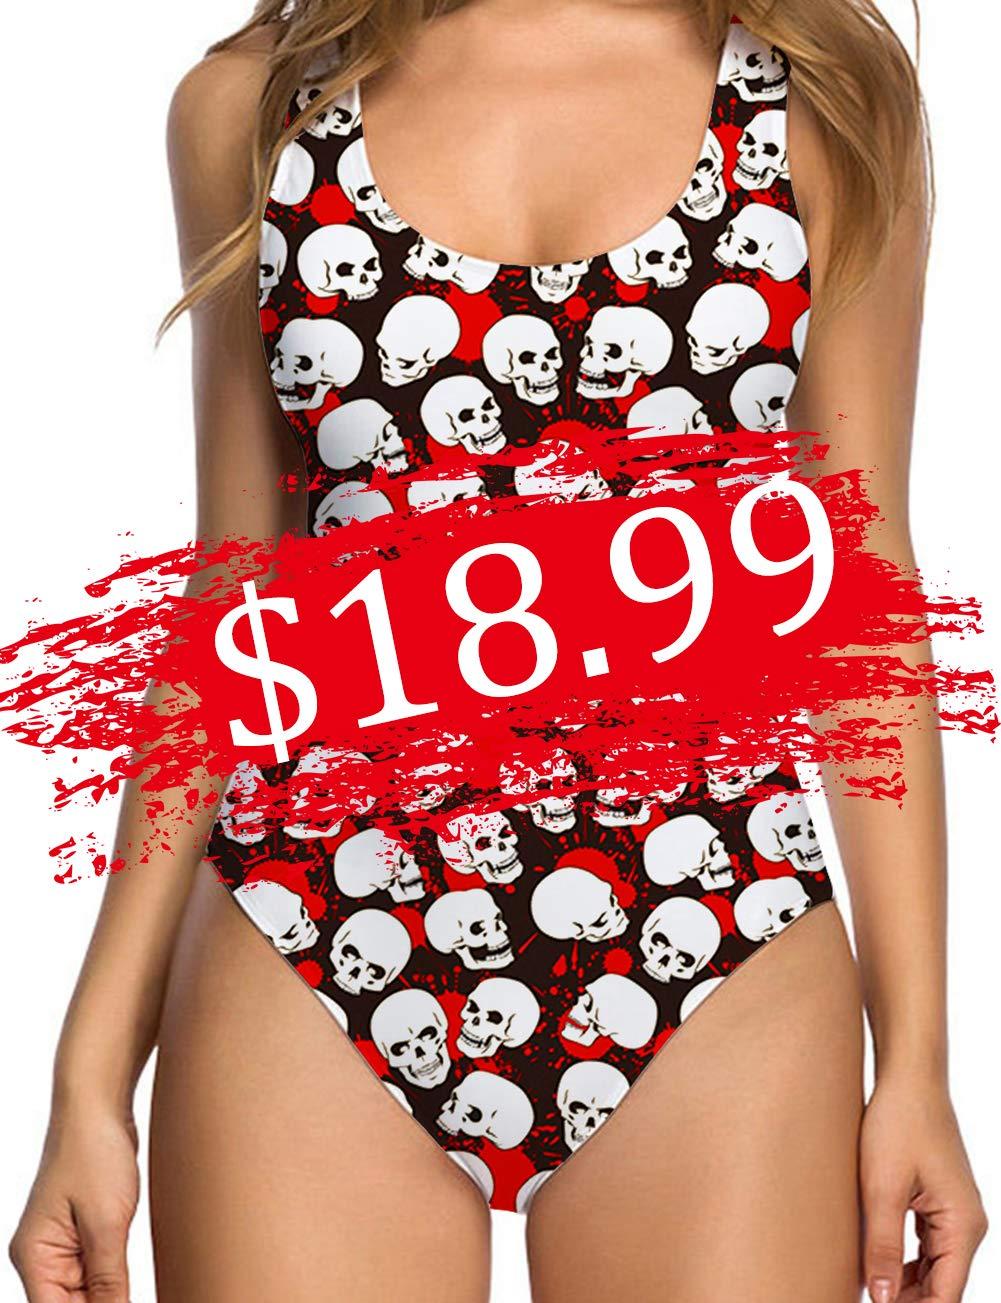 TUONROAD Retro 80s/90s One Piece Swimsuit Bodysuit for Women Ladies Halloween Print White Black Skull Red Blood Skeleton Funny 3D Printed Halter Straps U Neck Backness Padded Swimwear Jumpsuit